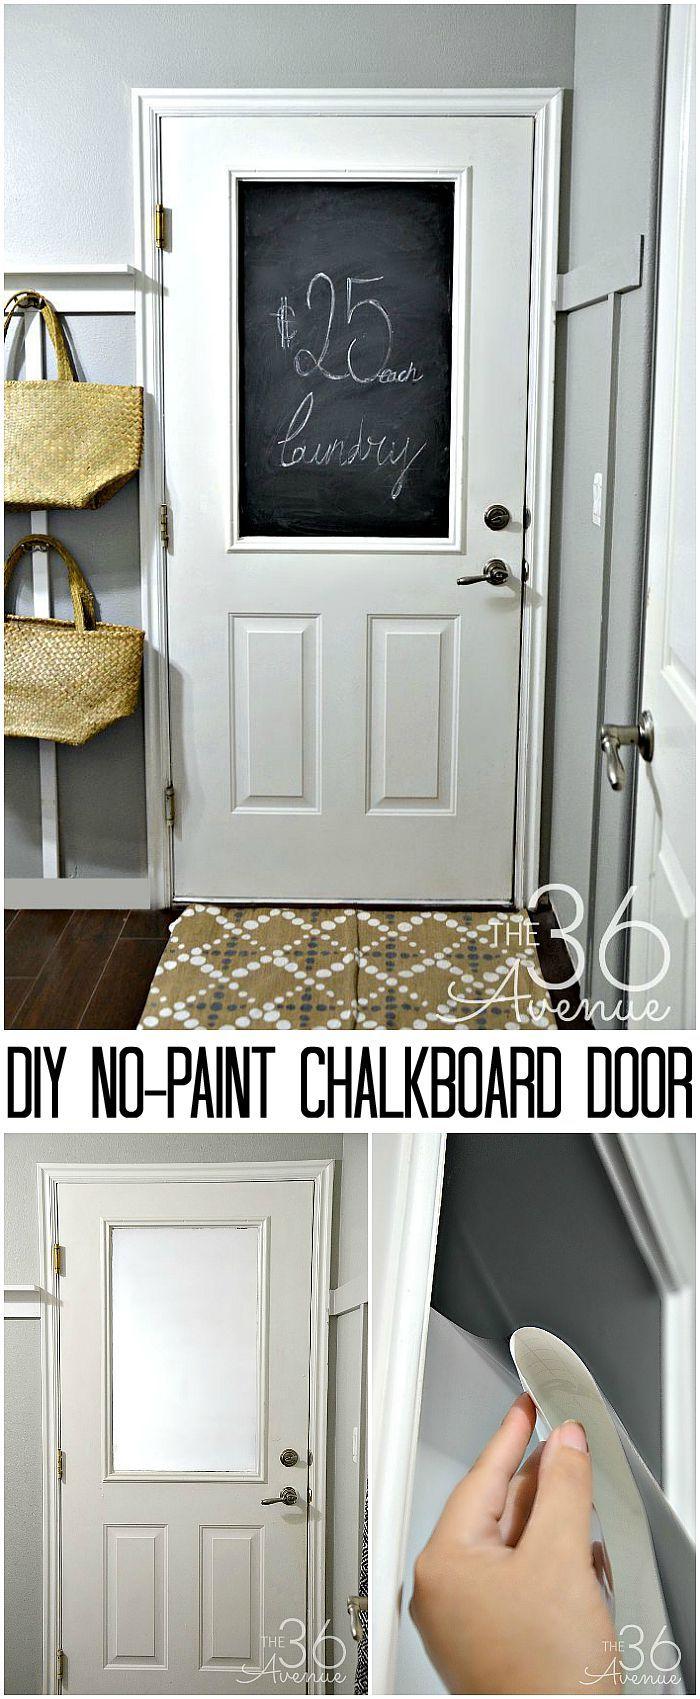 504 best Chalk Board Ideas images on Pinterest | Chalk talk ...